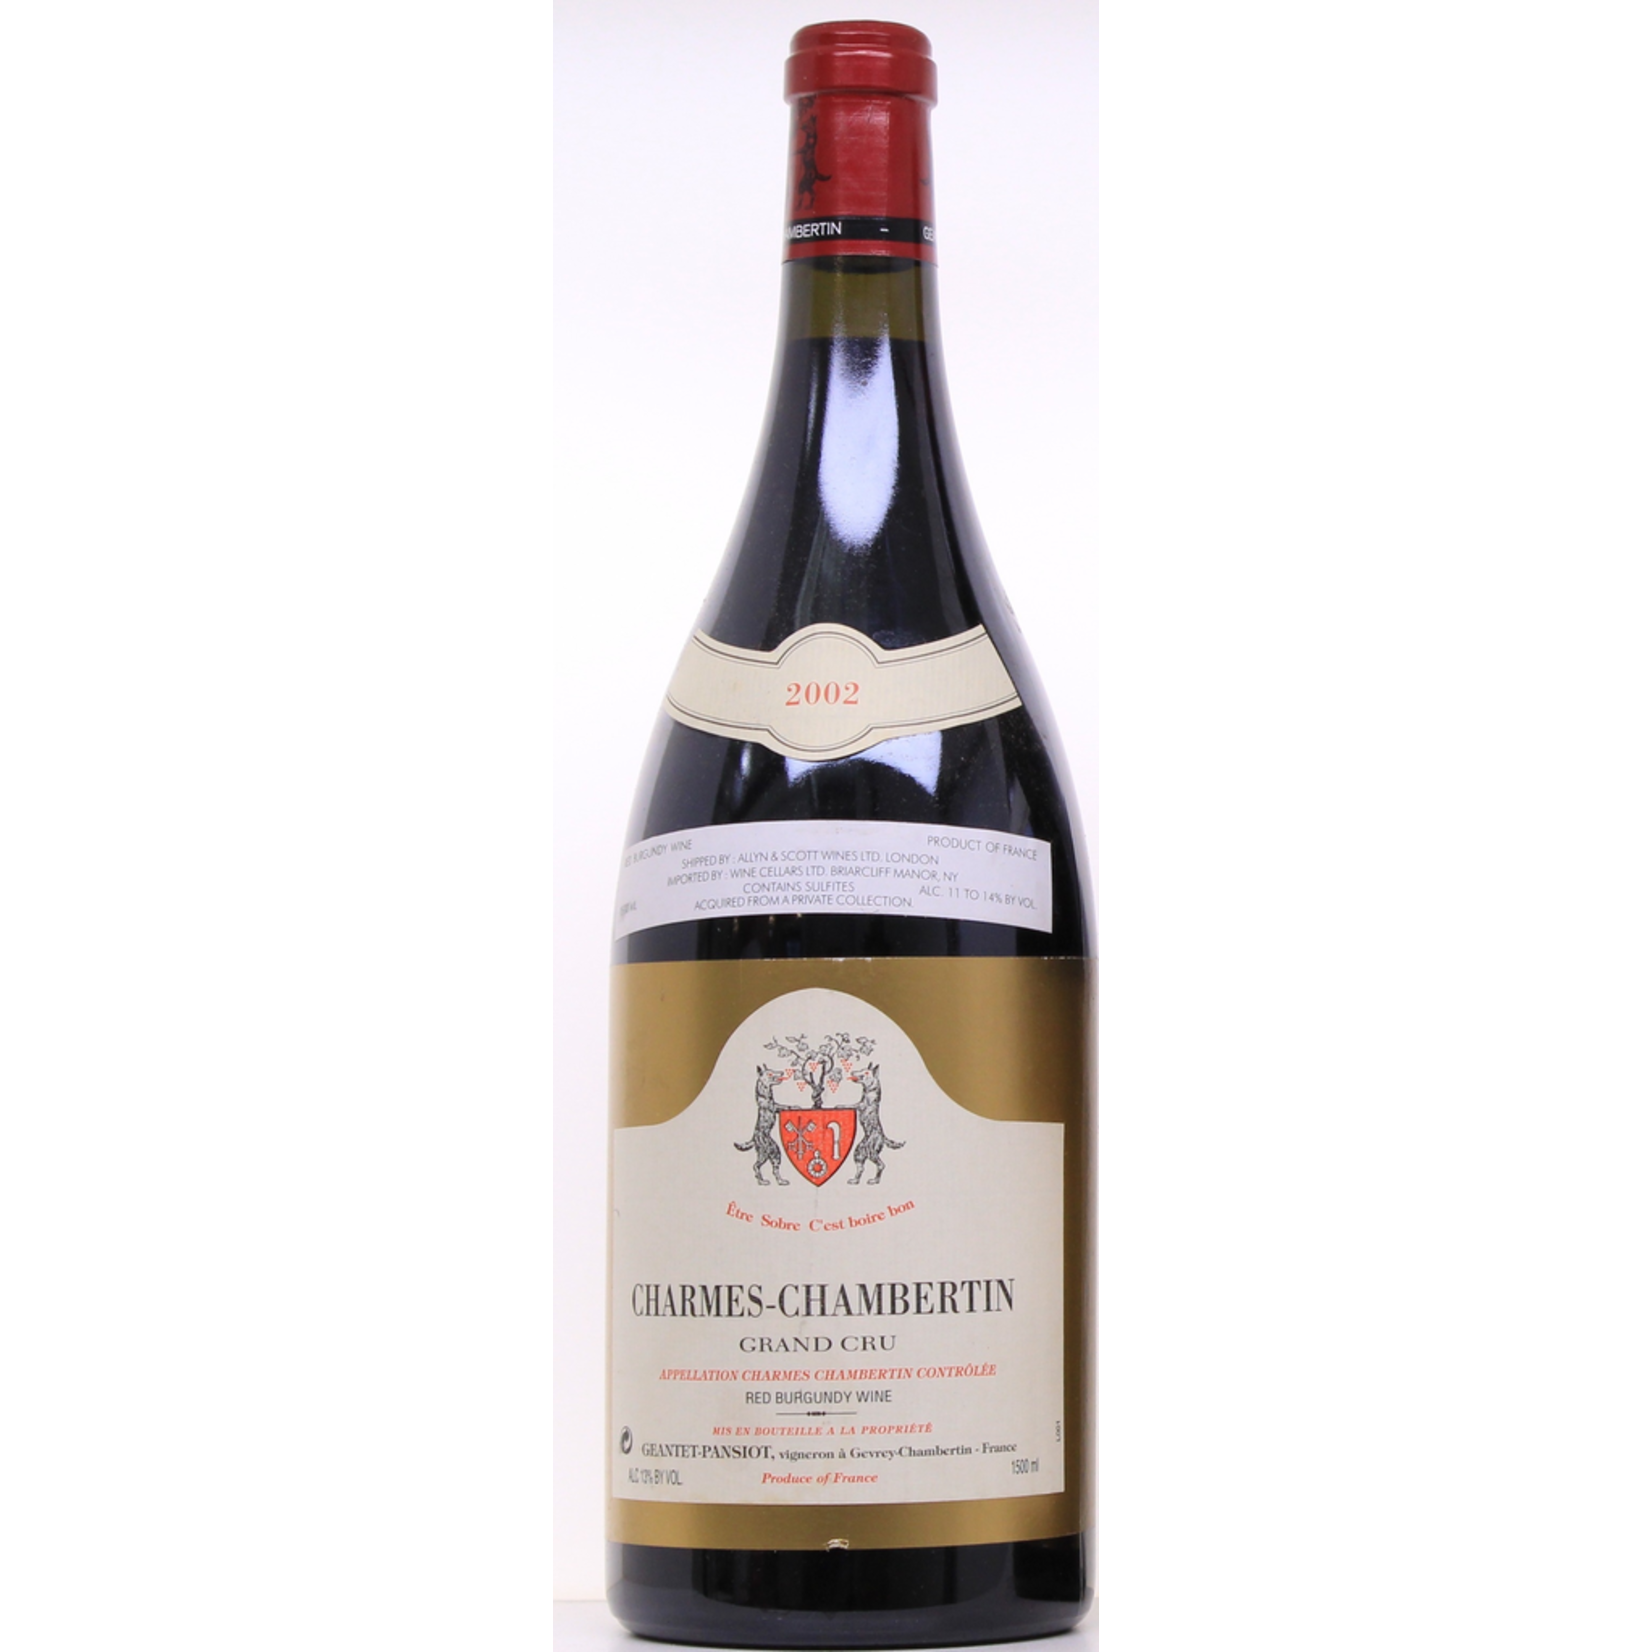 Wine Geantet-Pansiot Charmes Chambertin Grand Cru 2002 1.5L